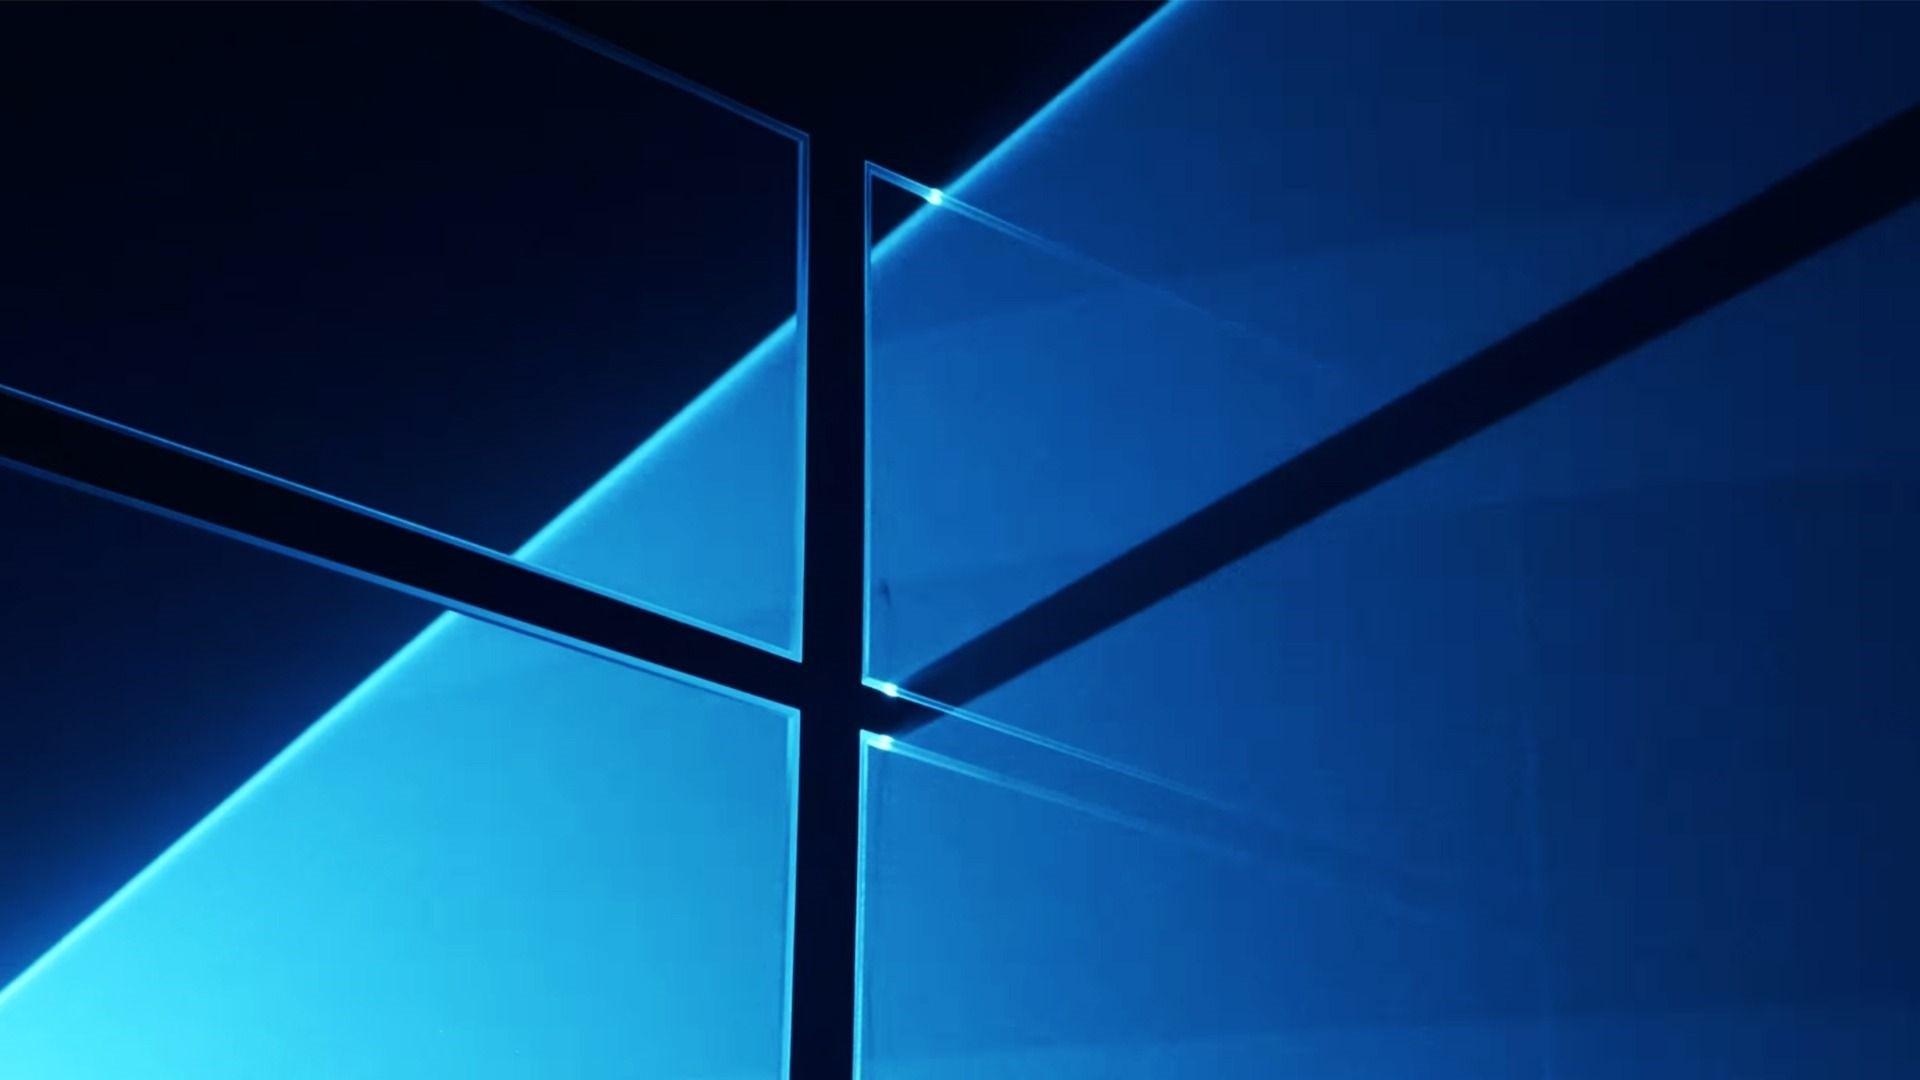 Microsoft High Quality